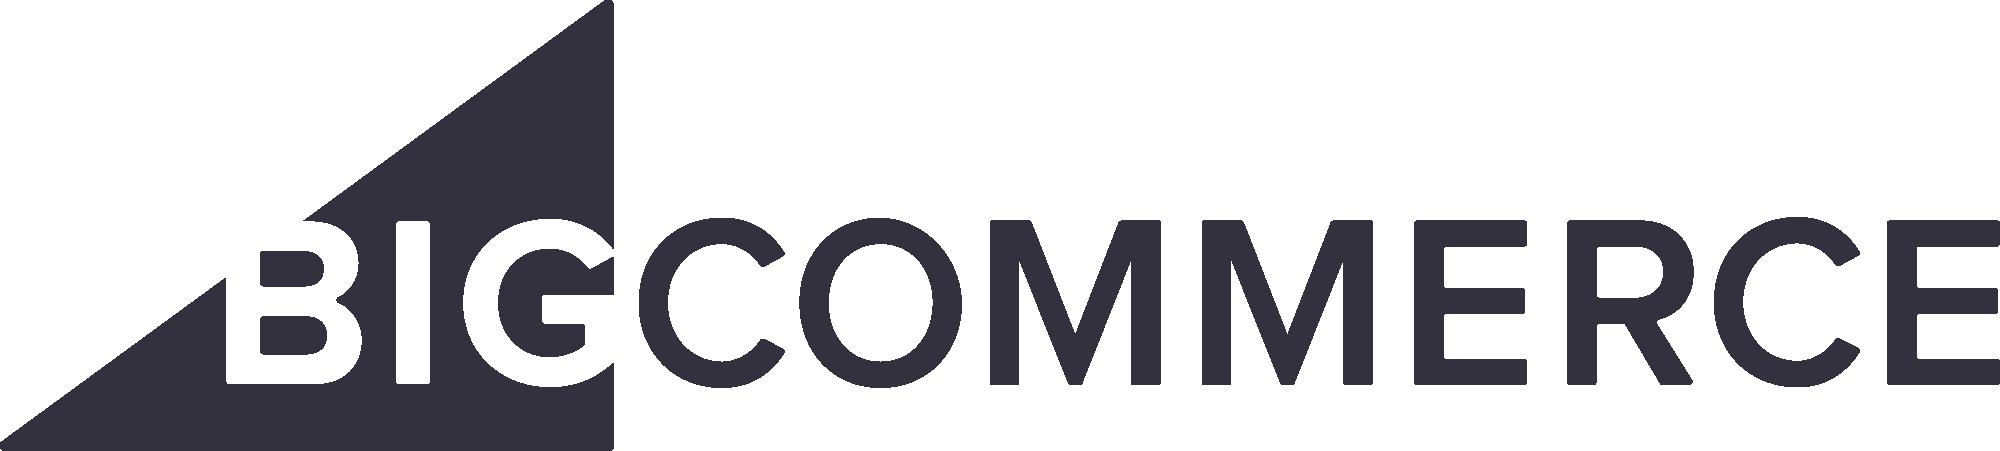 BigCommerce-logo-dark.png